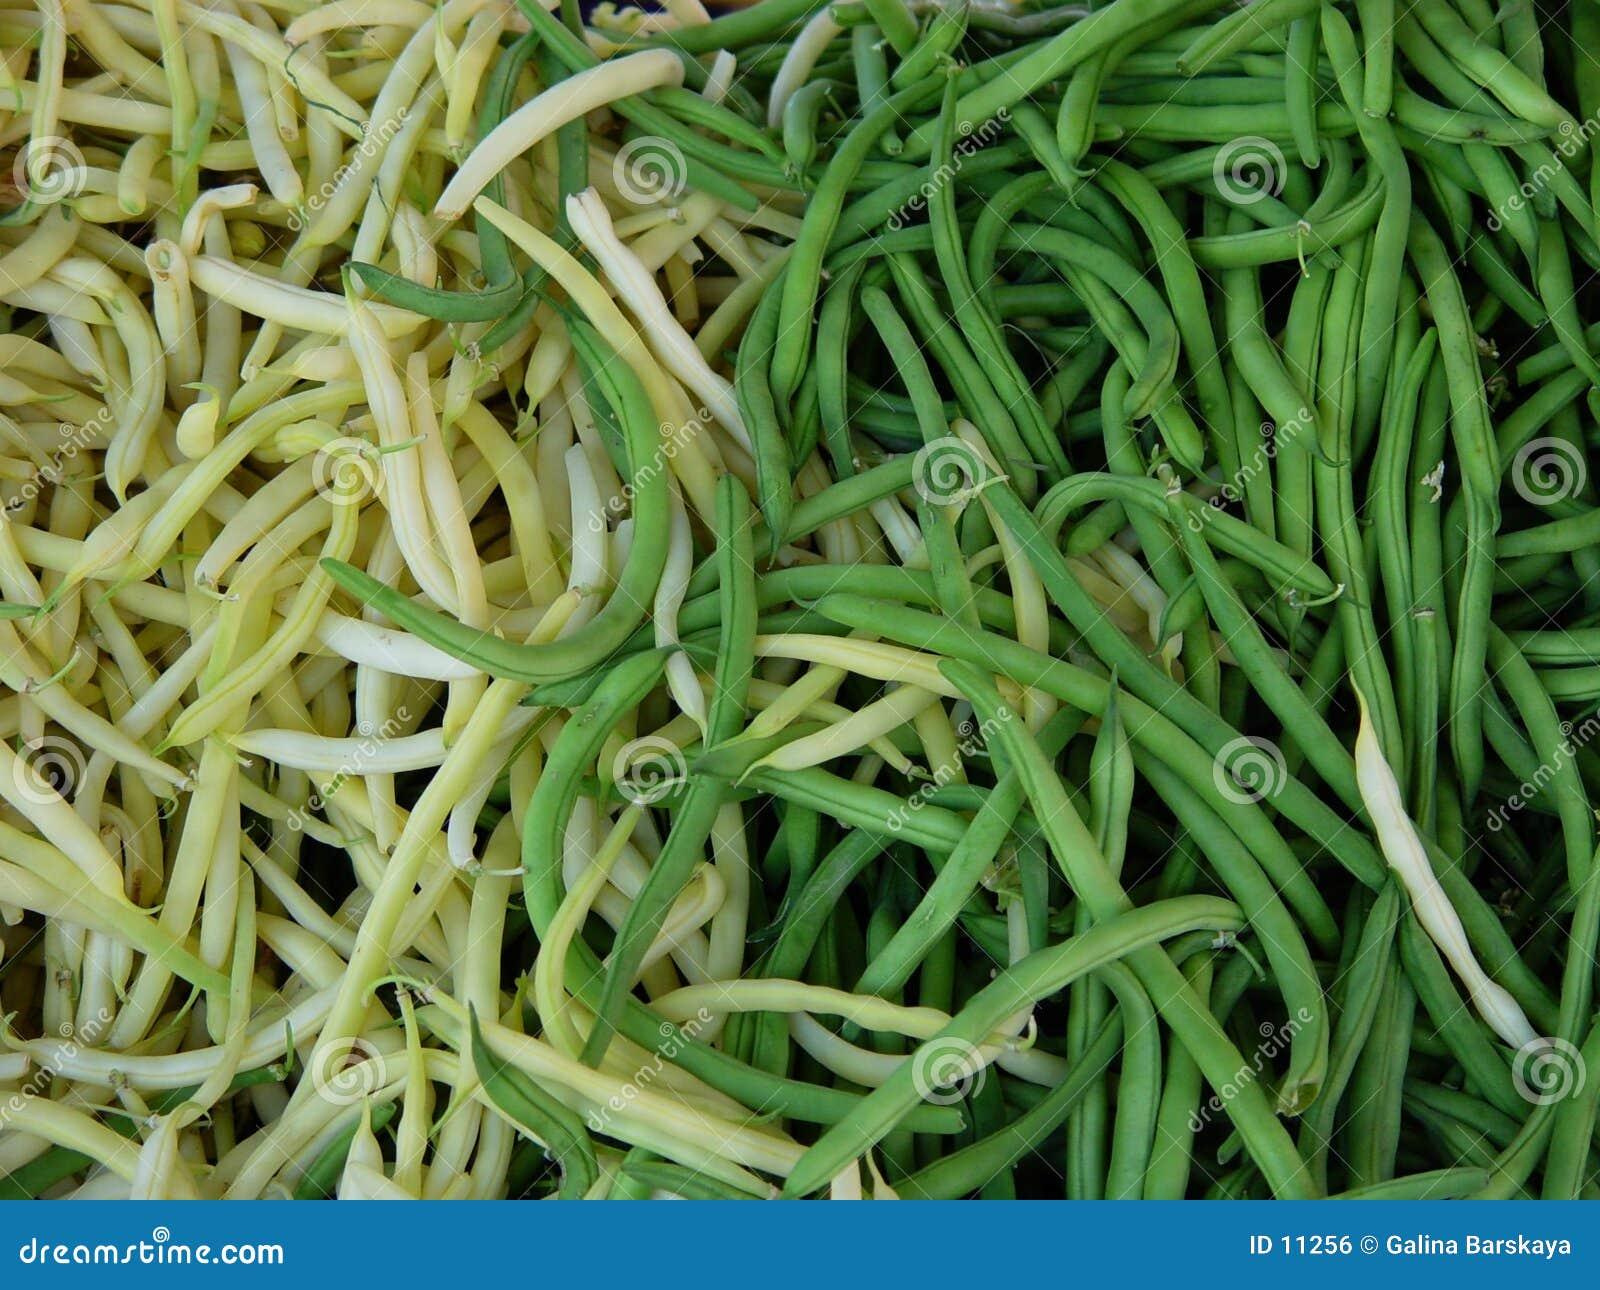 Bean string